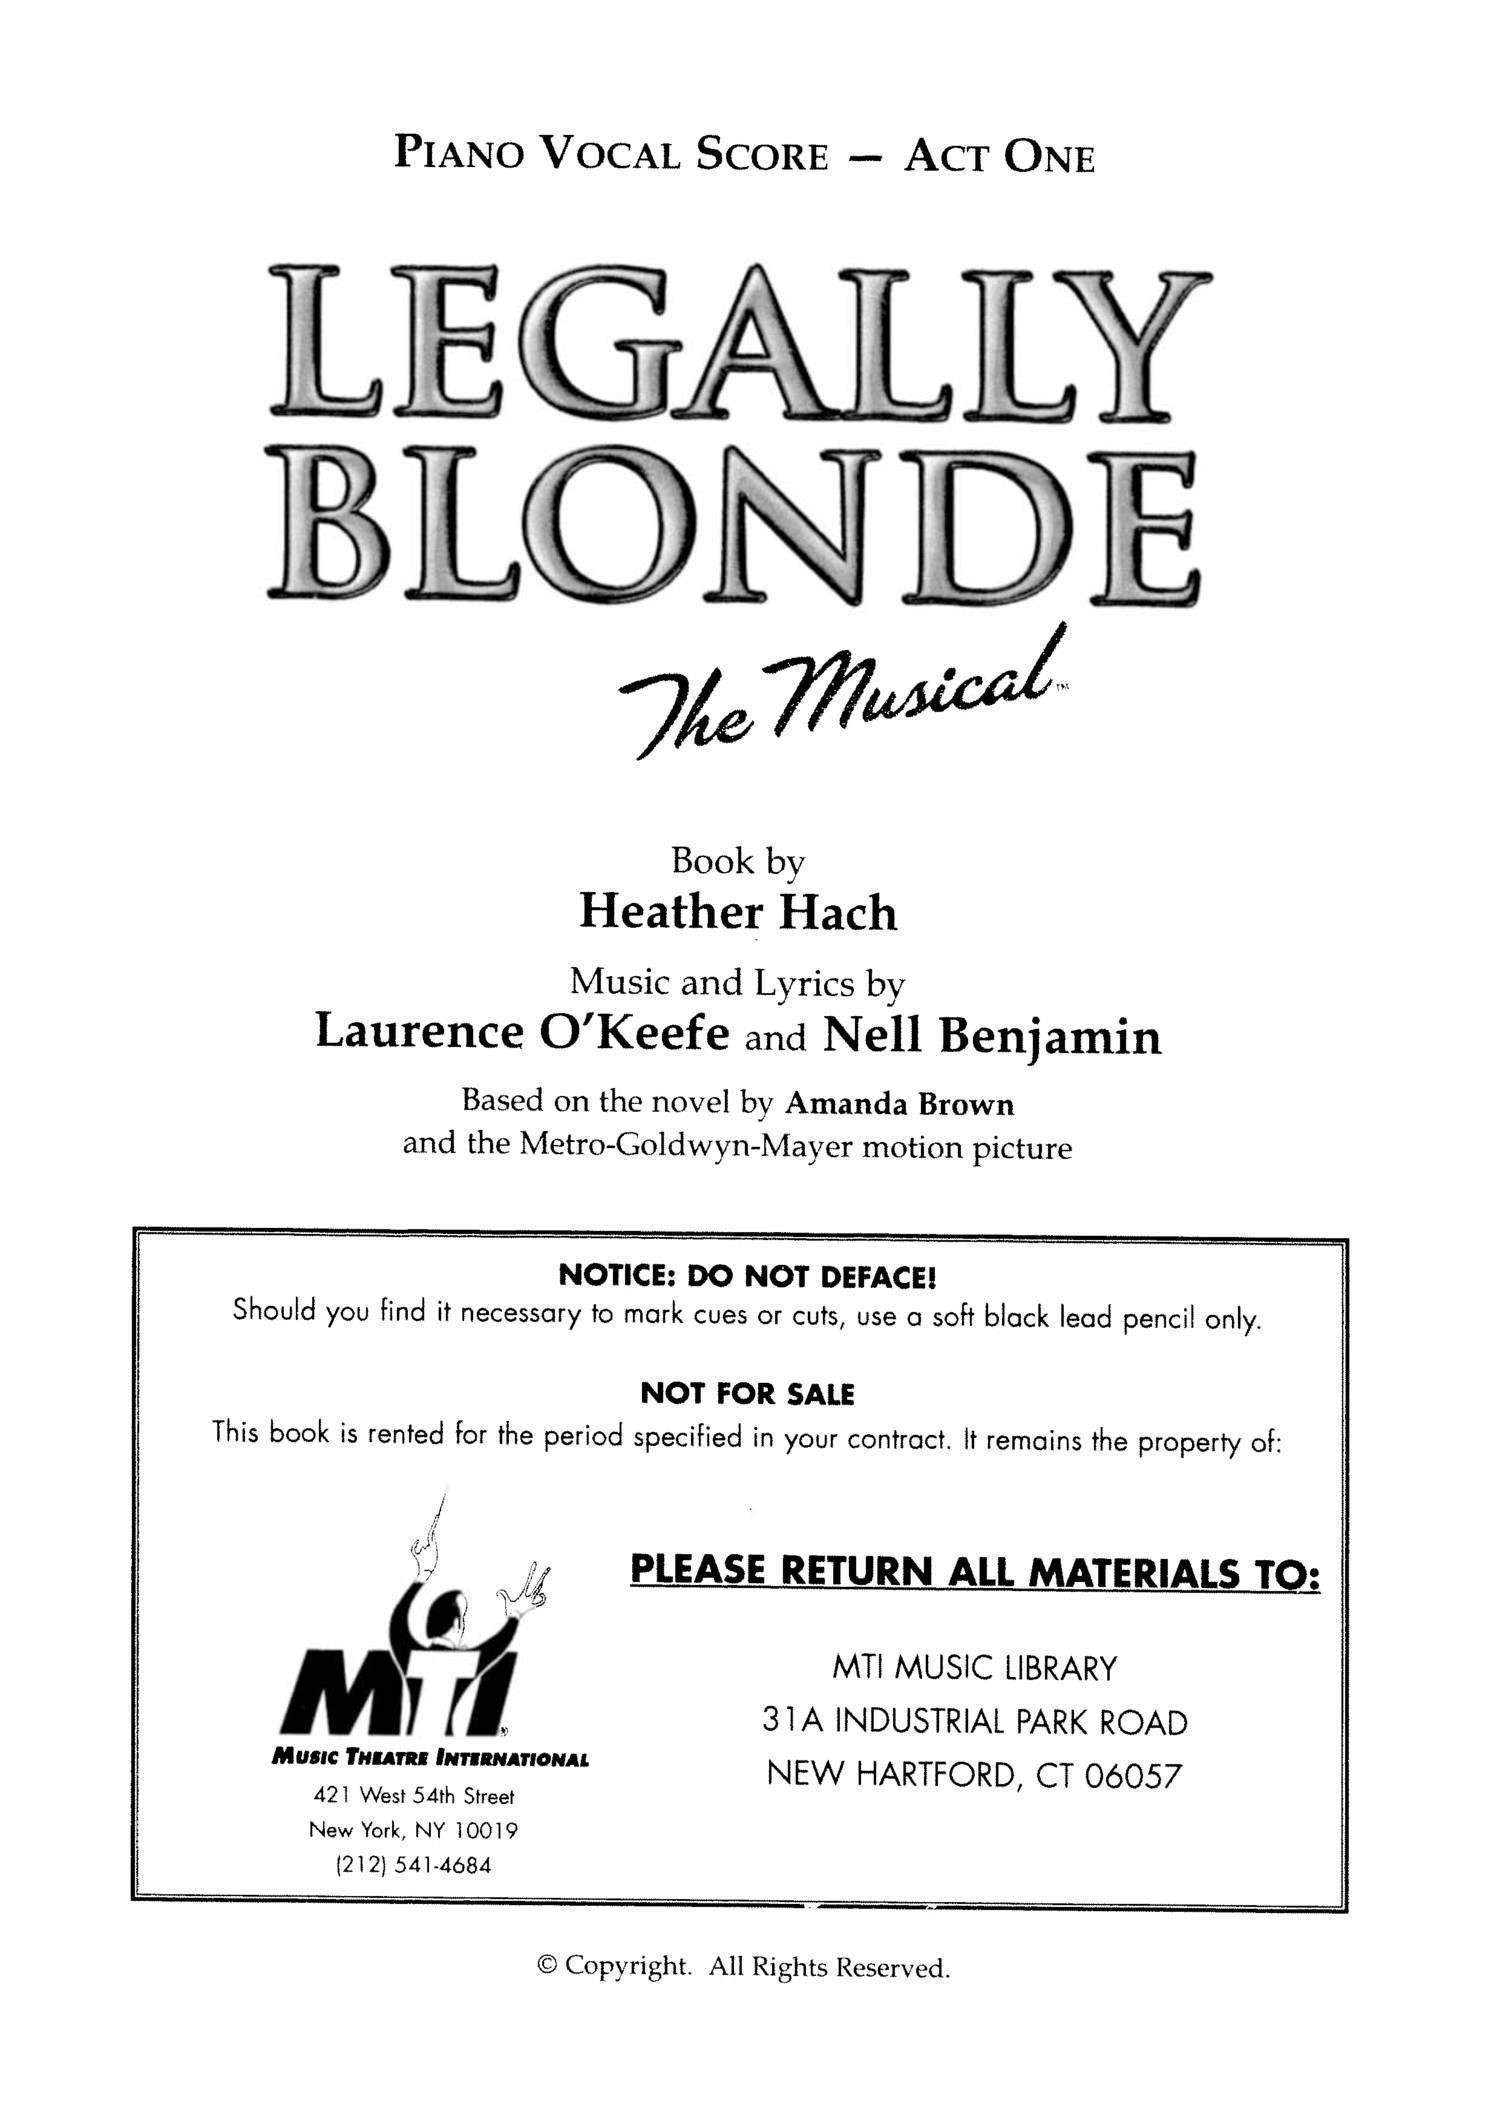 Legally Blonde - Score pdf | DocDroid